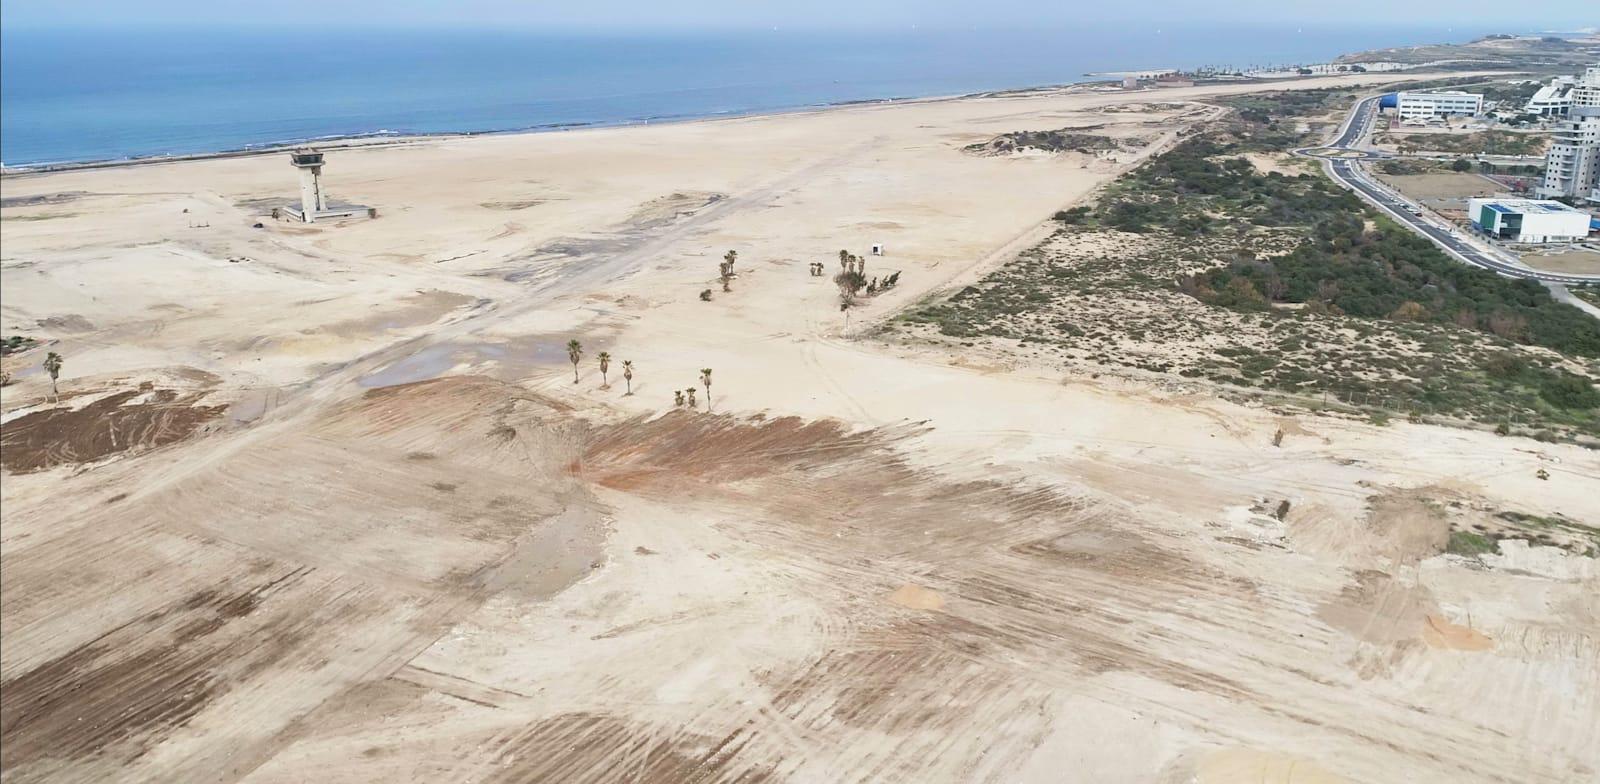 Former Sde Dov Airport Credit: Ministry of Defense